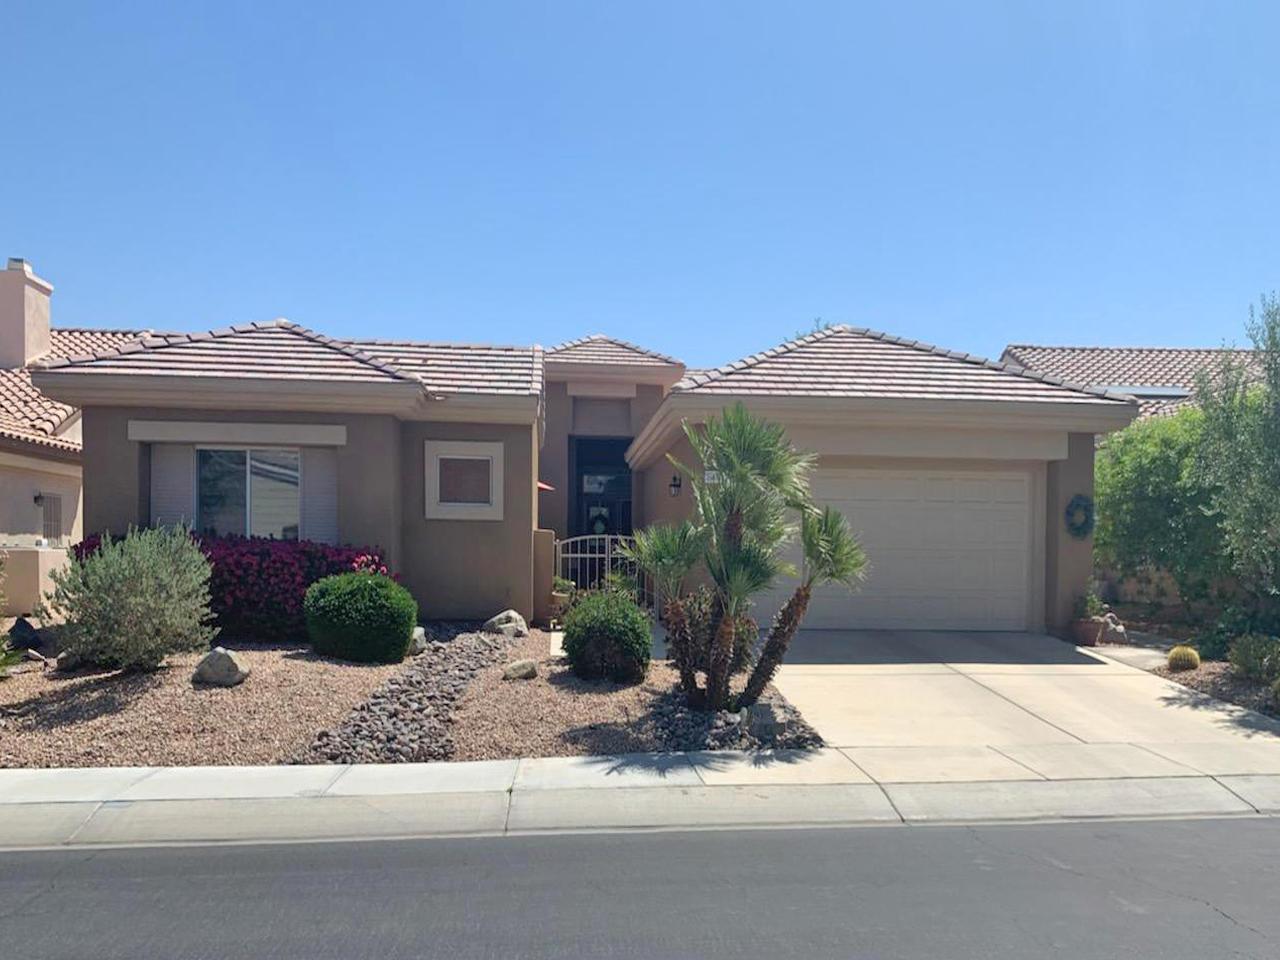 Photo of 35876 Bramblewood Avenue, Palm Desert, CA 92211